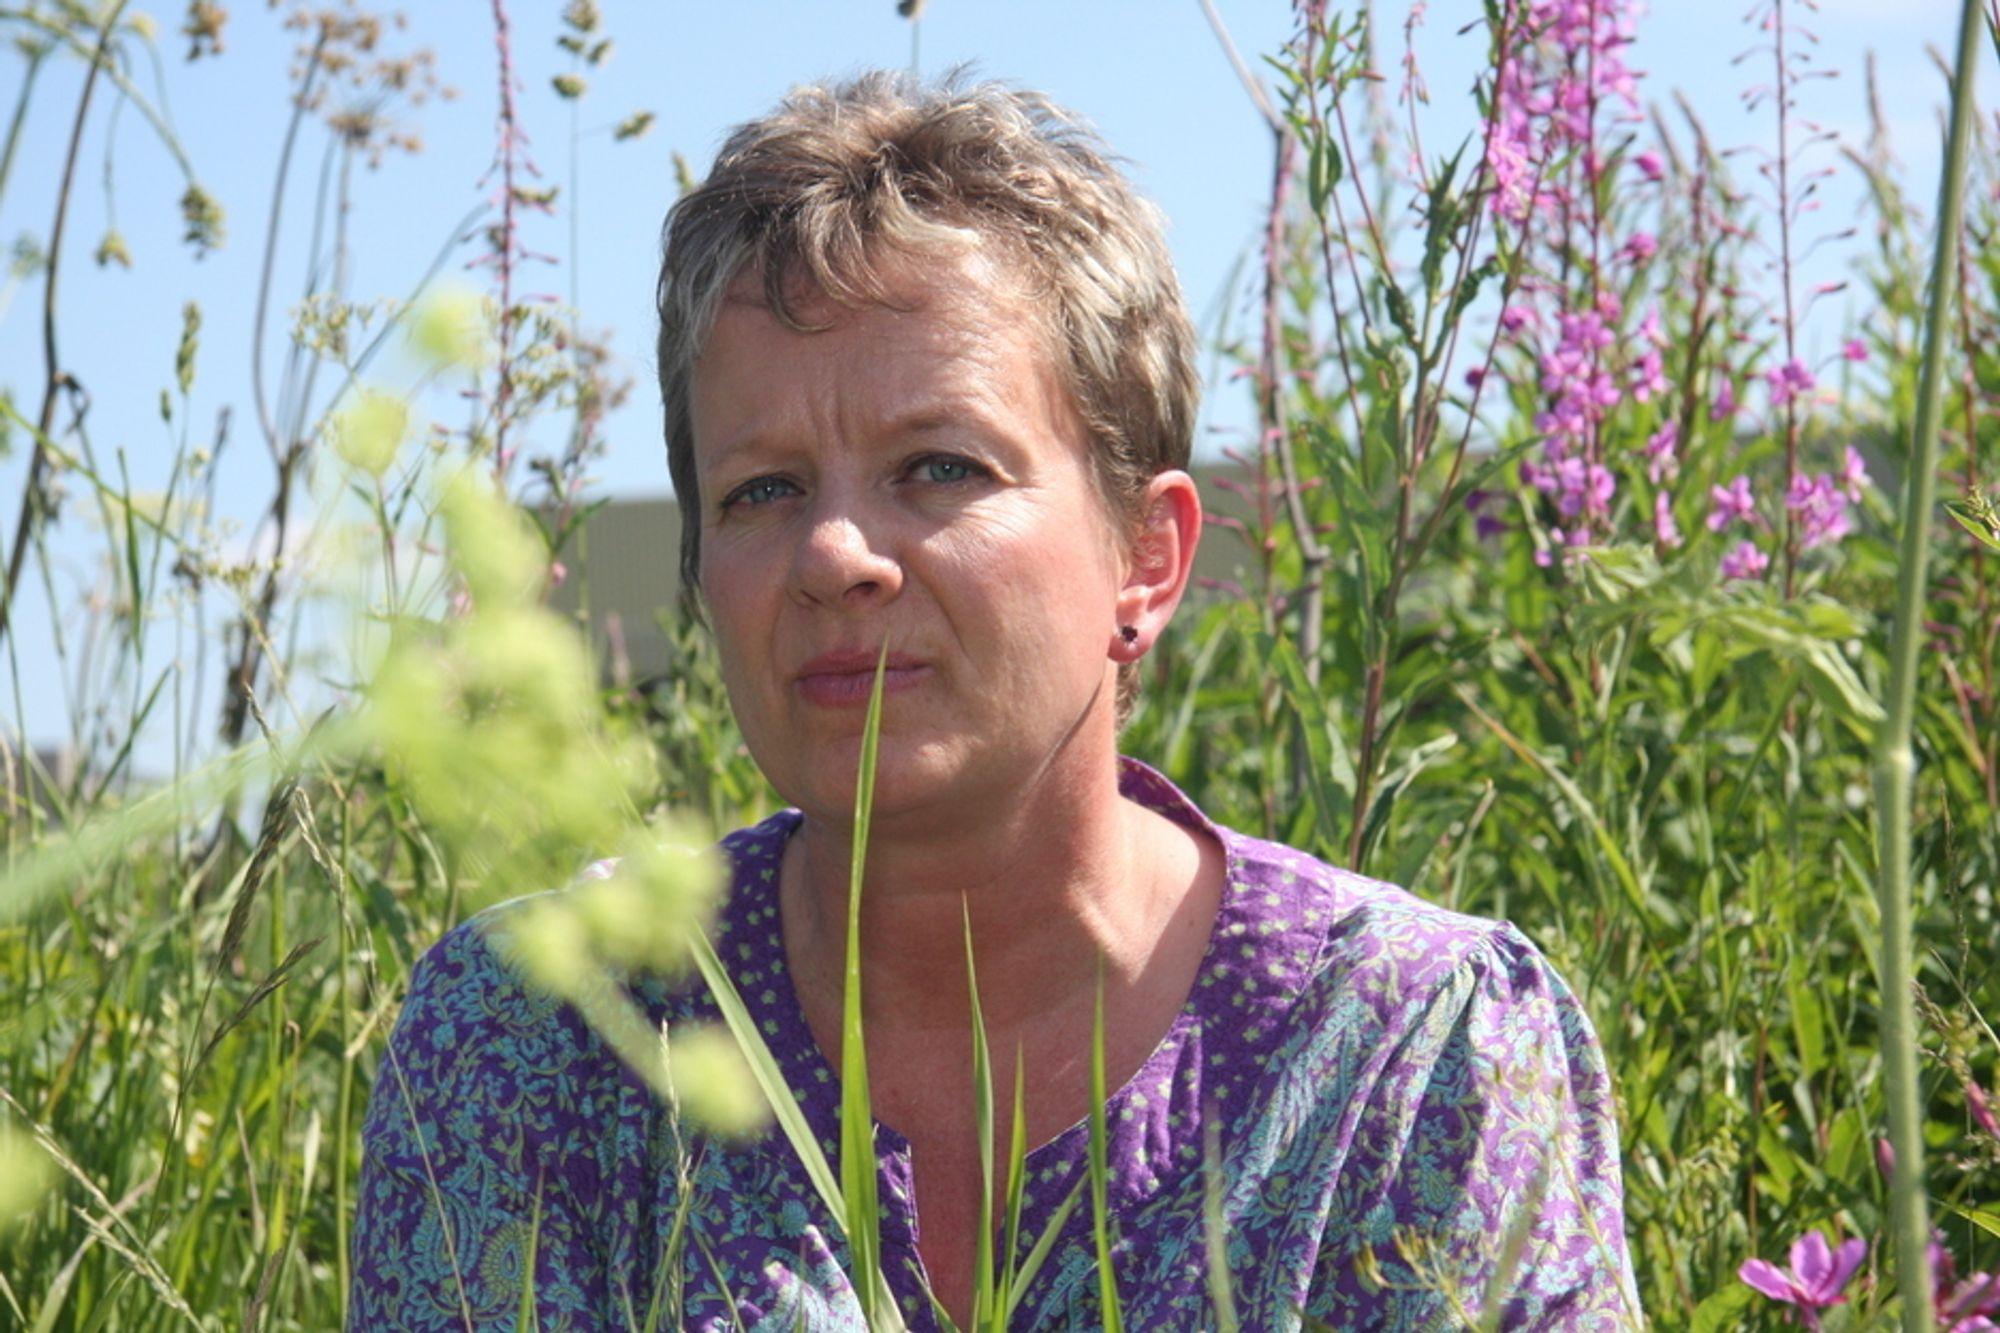 Direktør Janne Sollie i Direktoratet for naturforvaltning er skeptisk til de grønne sertifikatene, som direktoratet mener vil gi ukritiske inngrep i naturen.